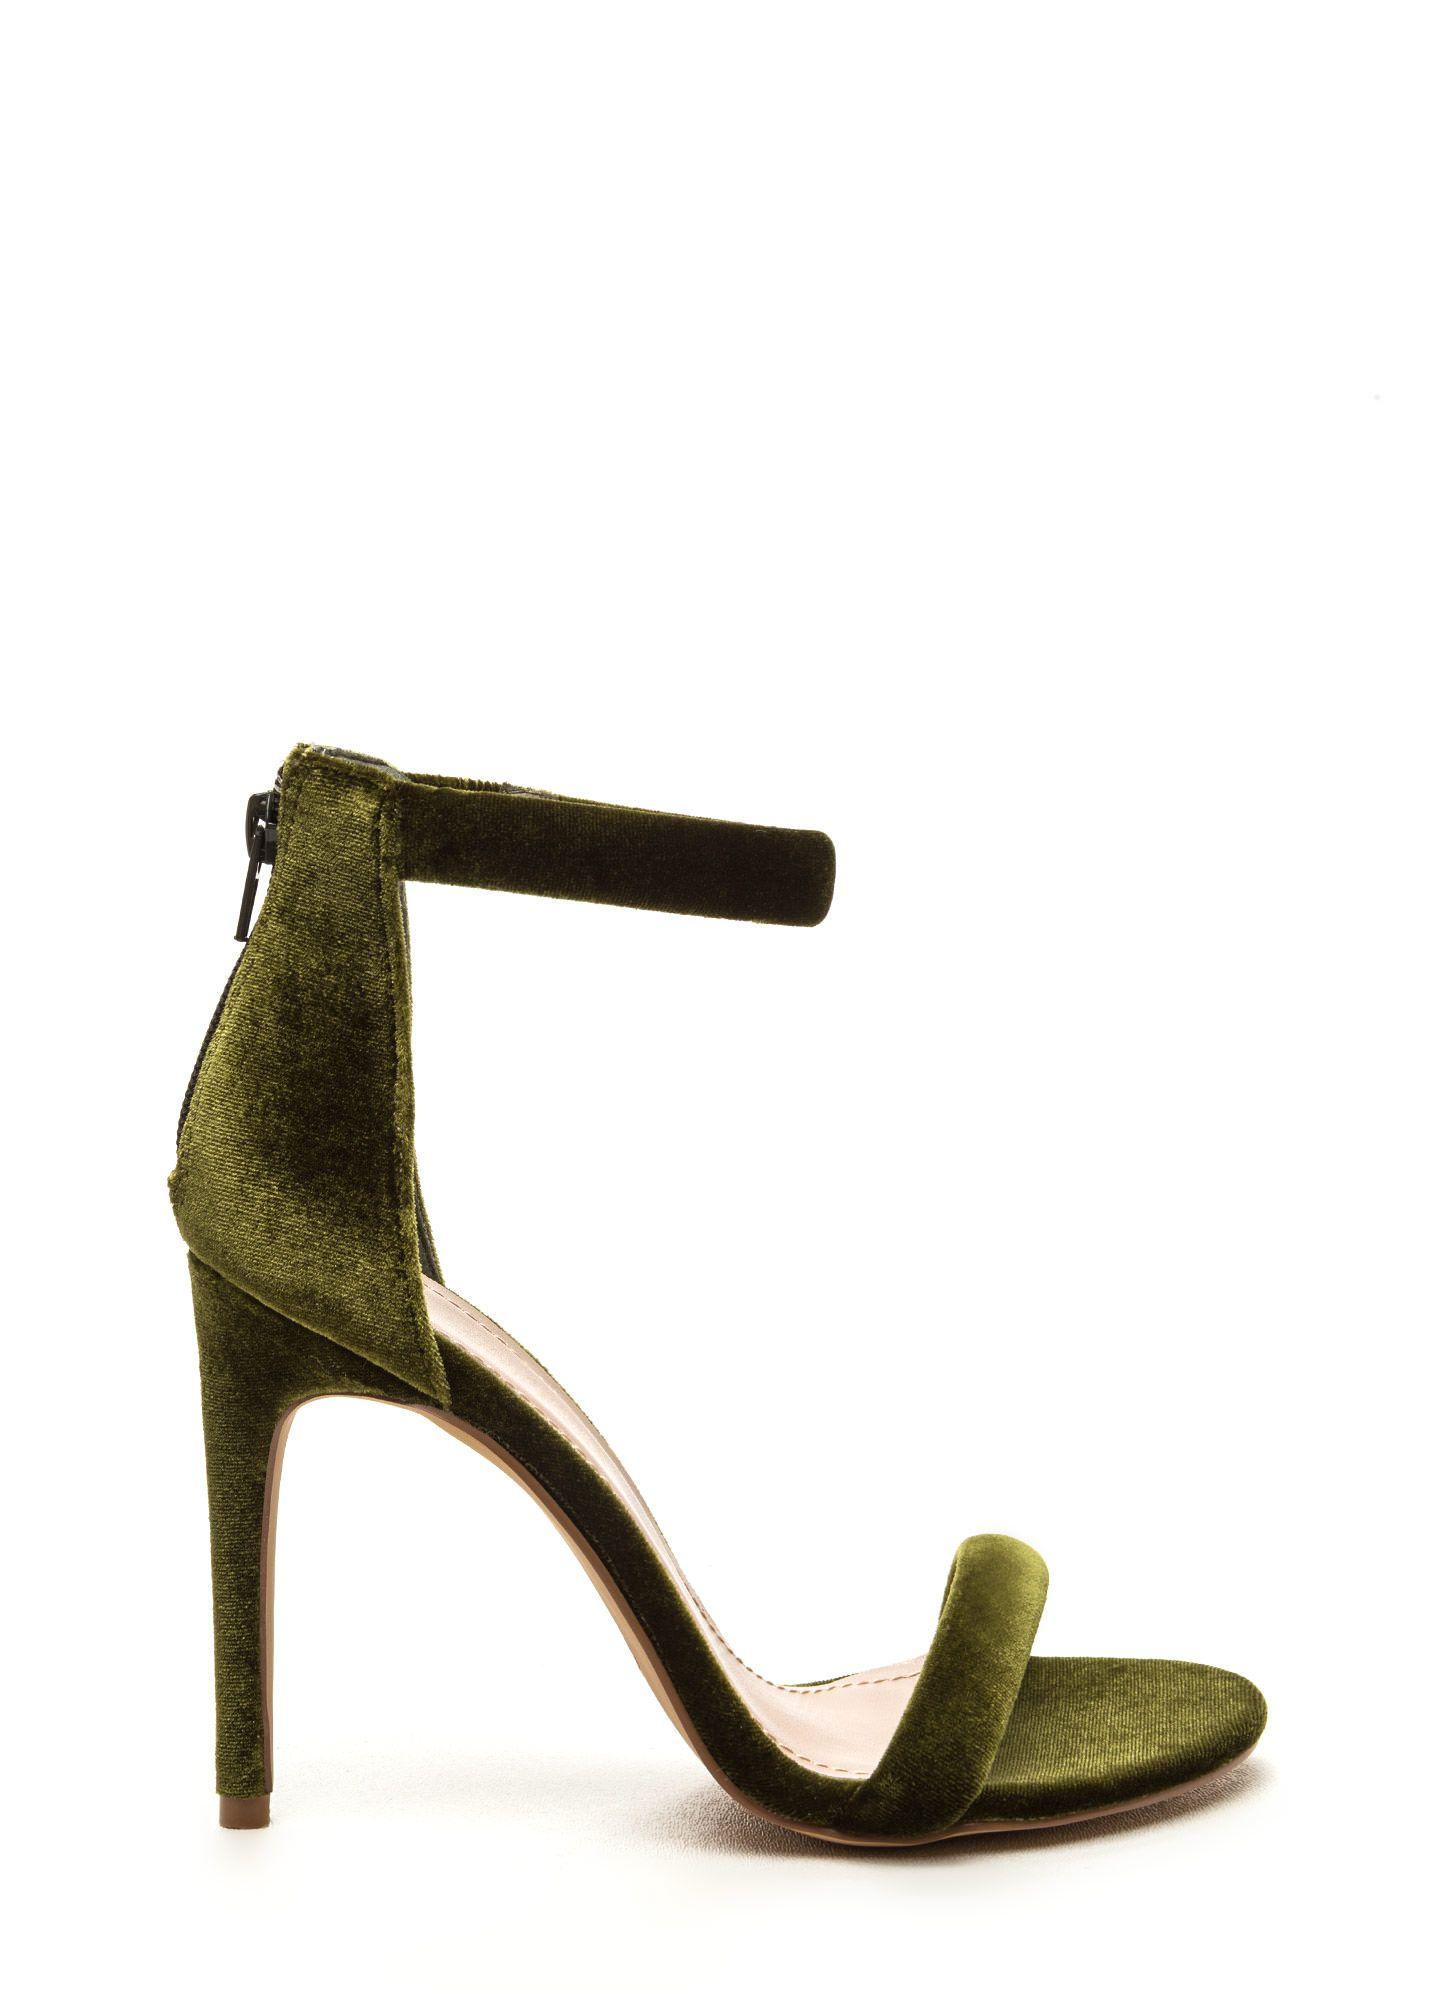 Velvet Allure Ankle Strap Heels OLIVE